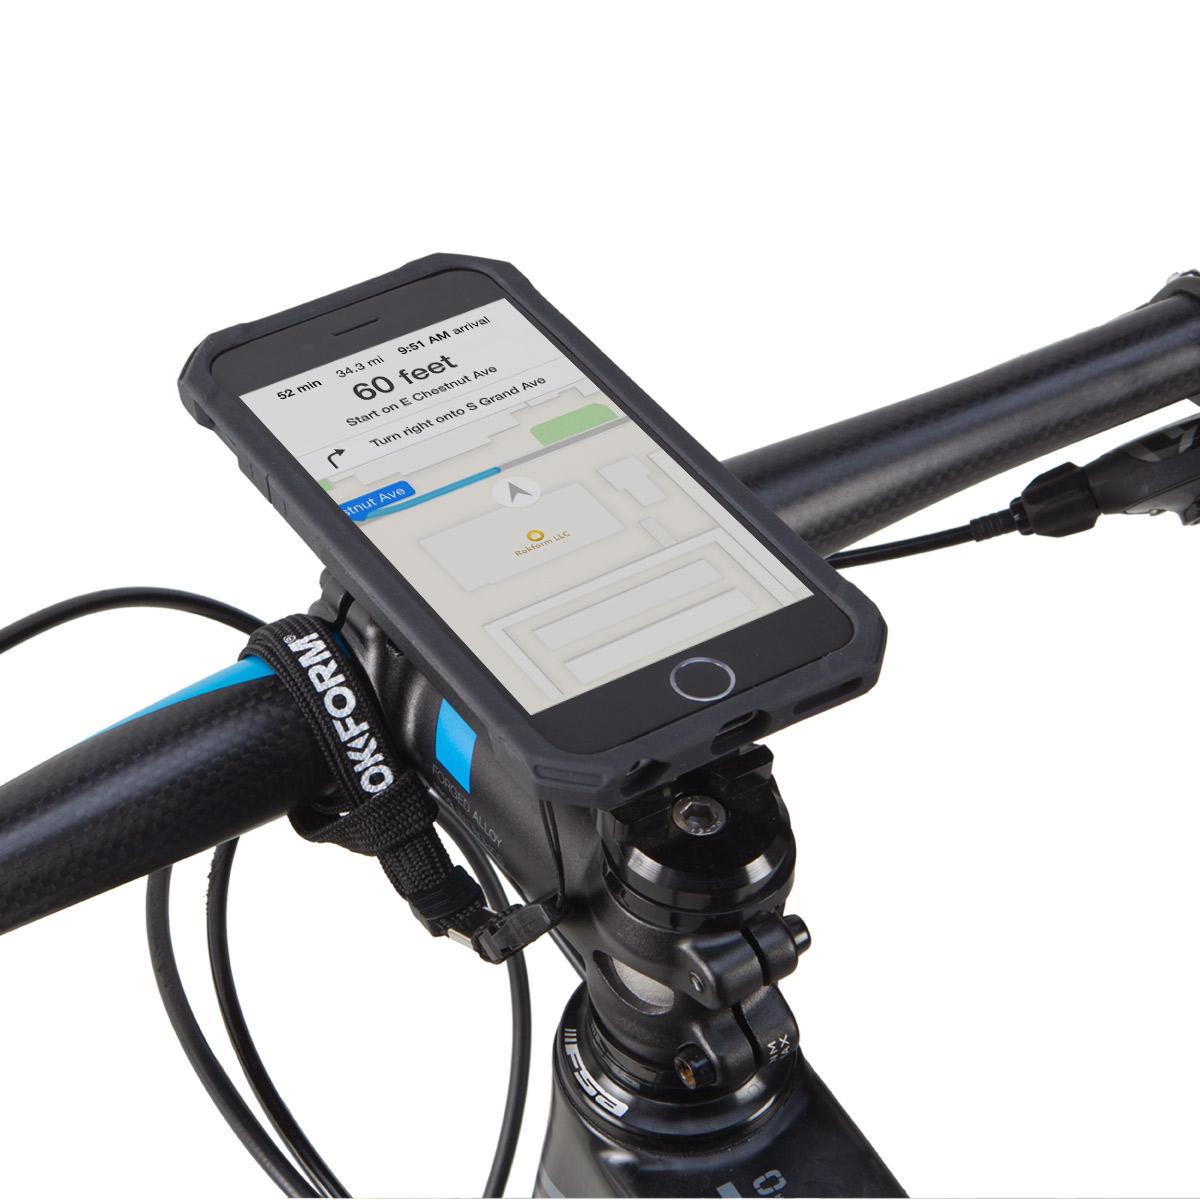 info for 319d7 ccbcf Details about Rokform Bike Mount Kit - iPhone 7 Plus / 8 Plus with Black  Rokshield Case